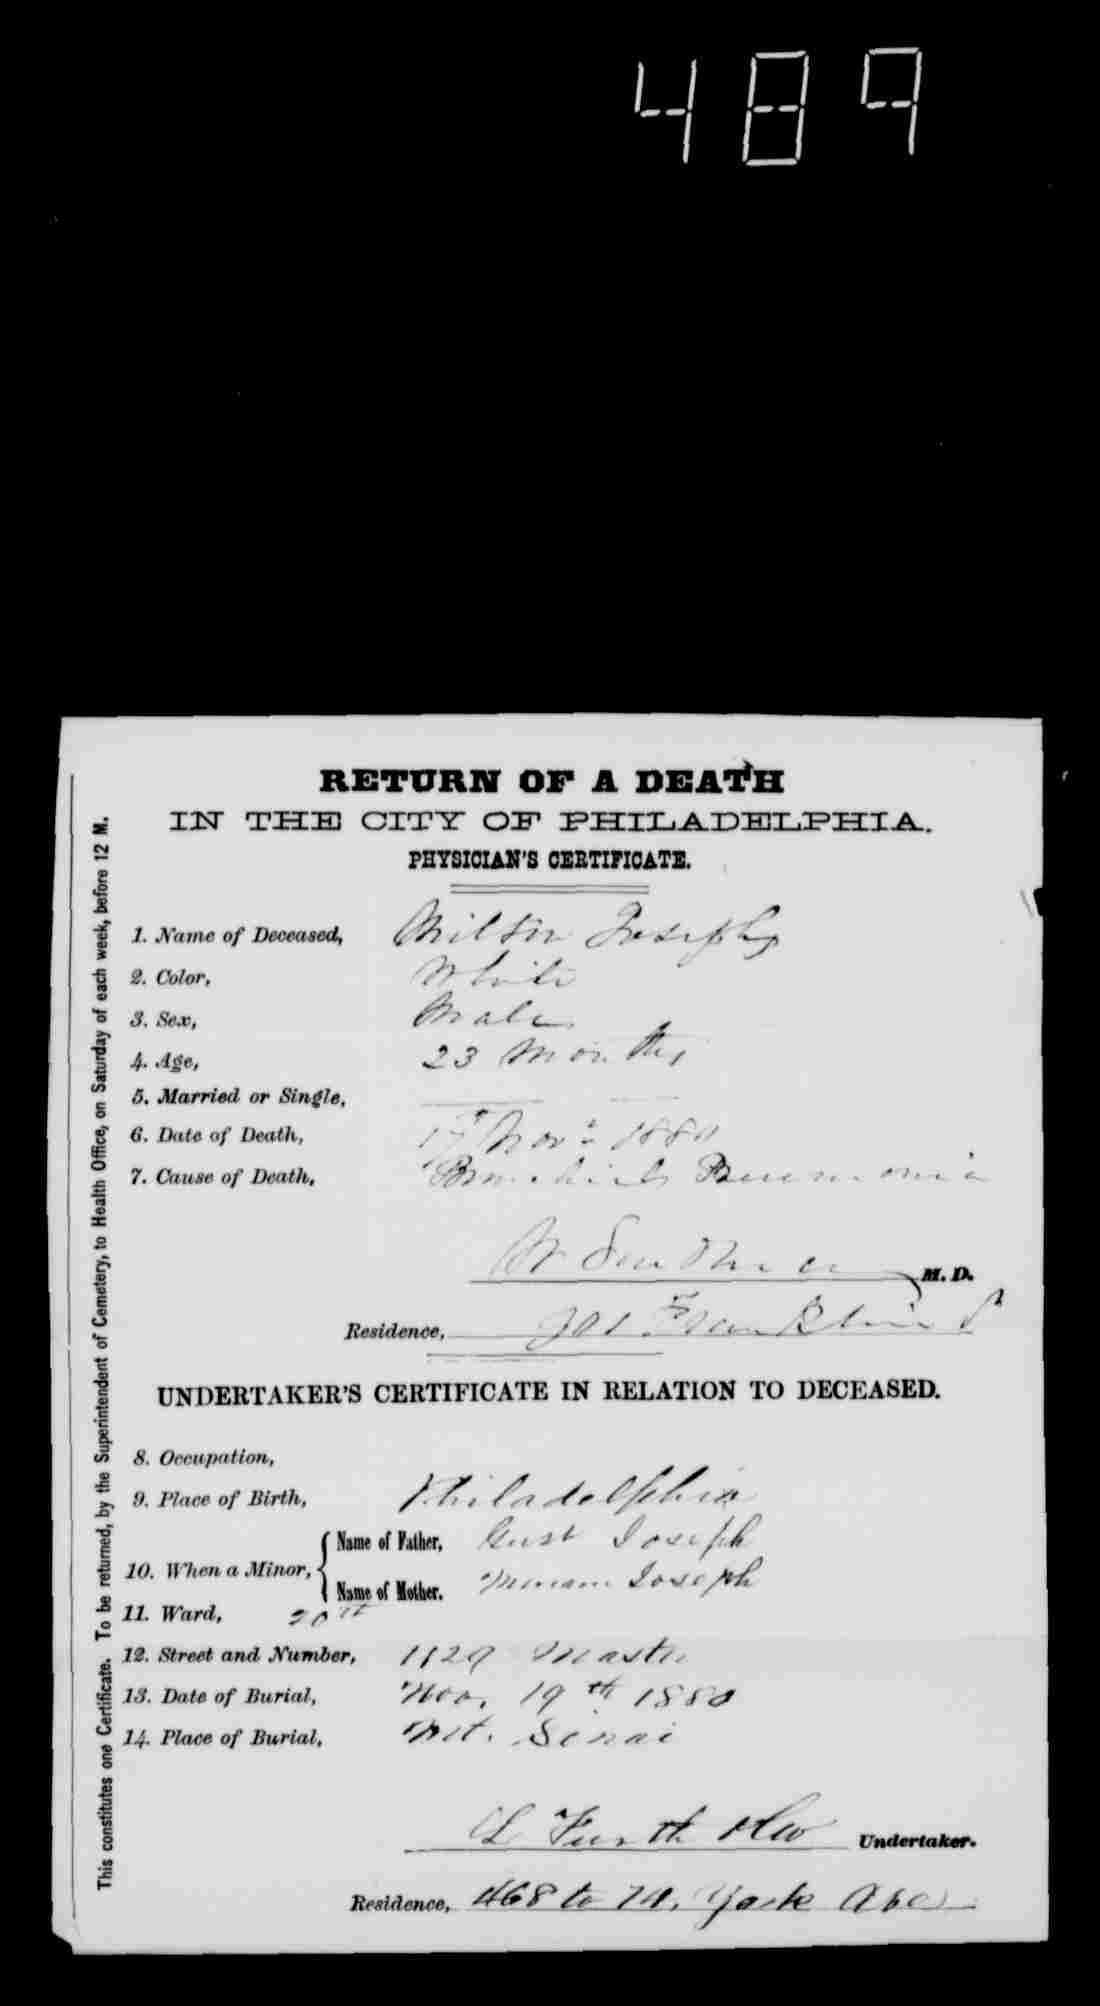 Familysearch brotmanblog a family journey milton josephs death certificate pennsylvania philadelphia city death certificates 1803 1915 aiddatafo Gallery